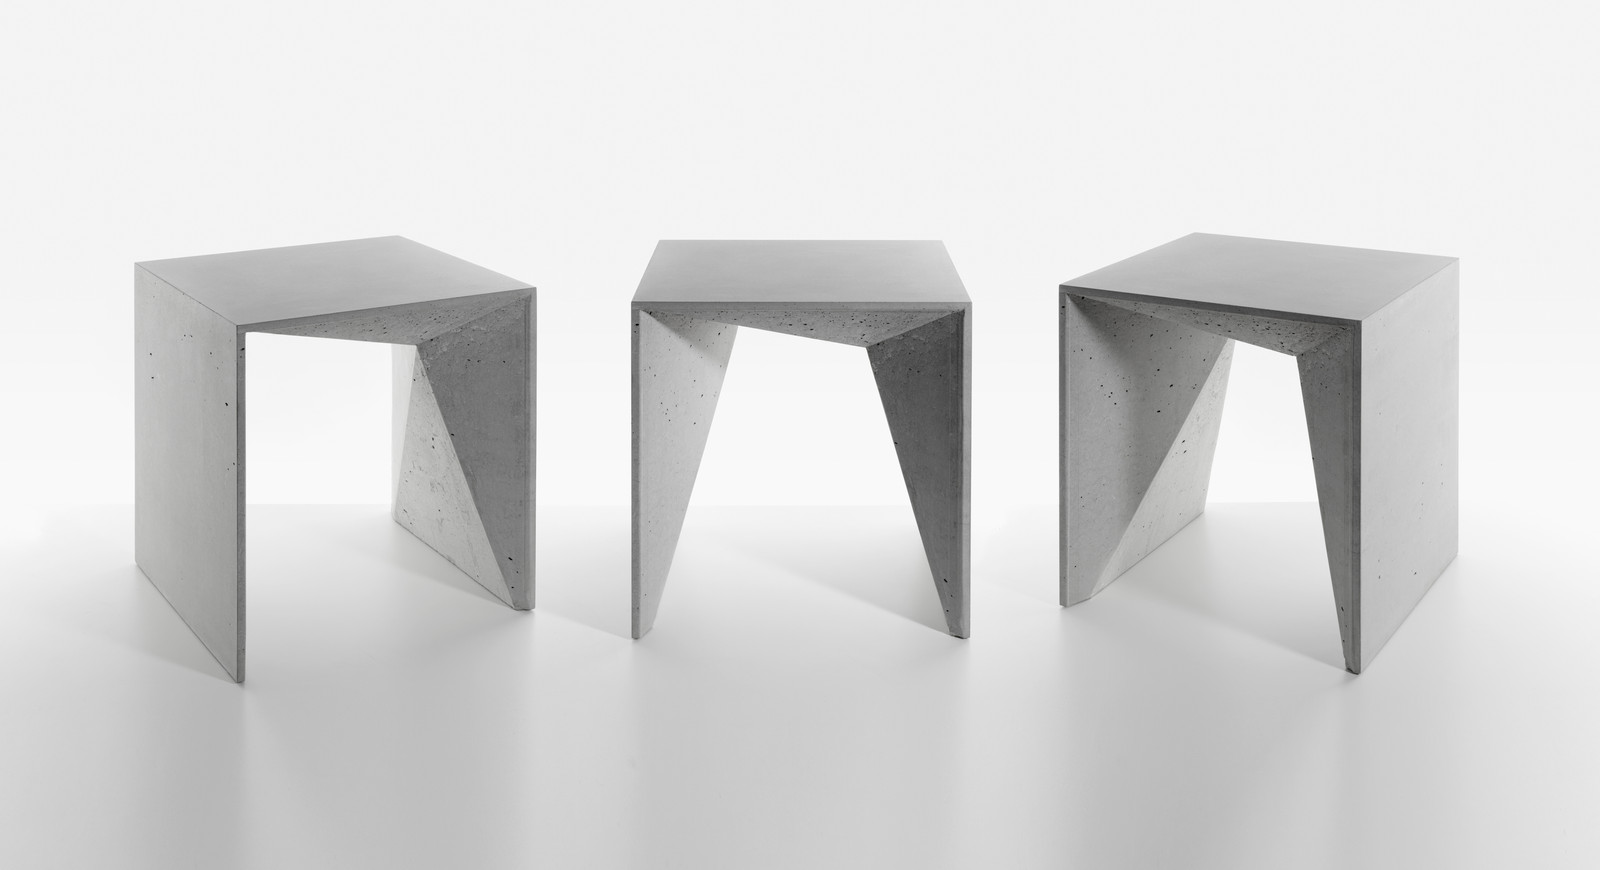 Foto Beton Mobel Foto Beton Quader Concrete Furniture Concrete